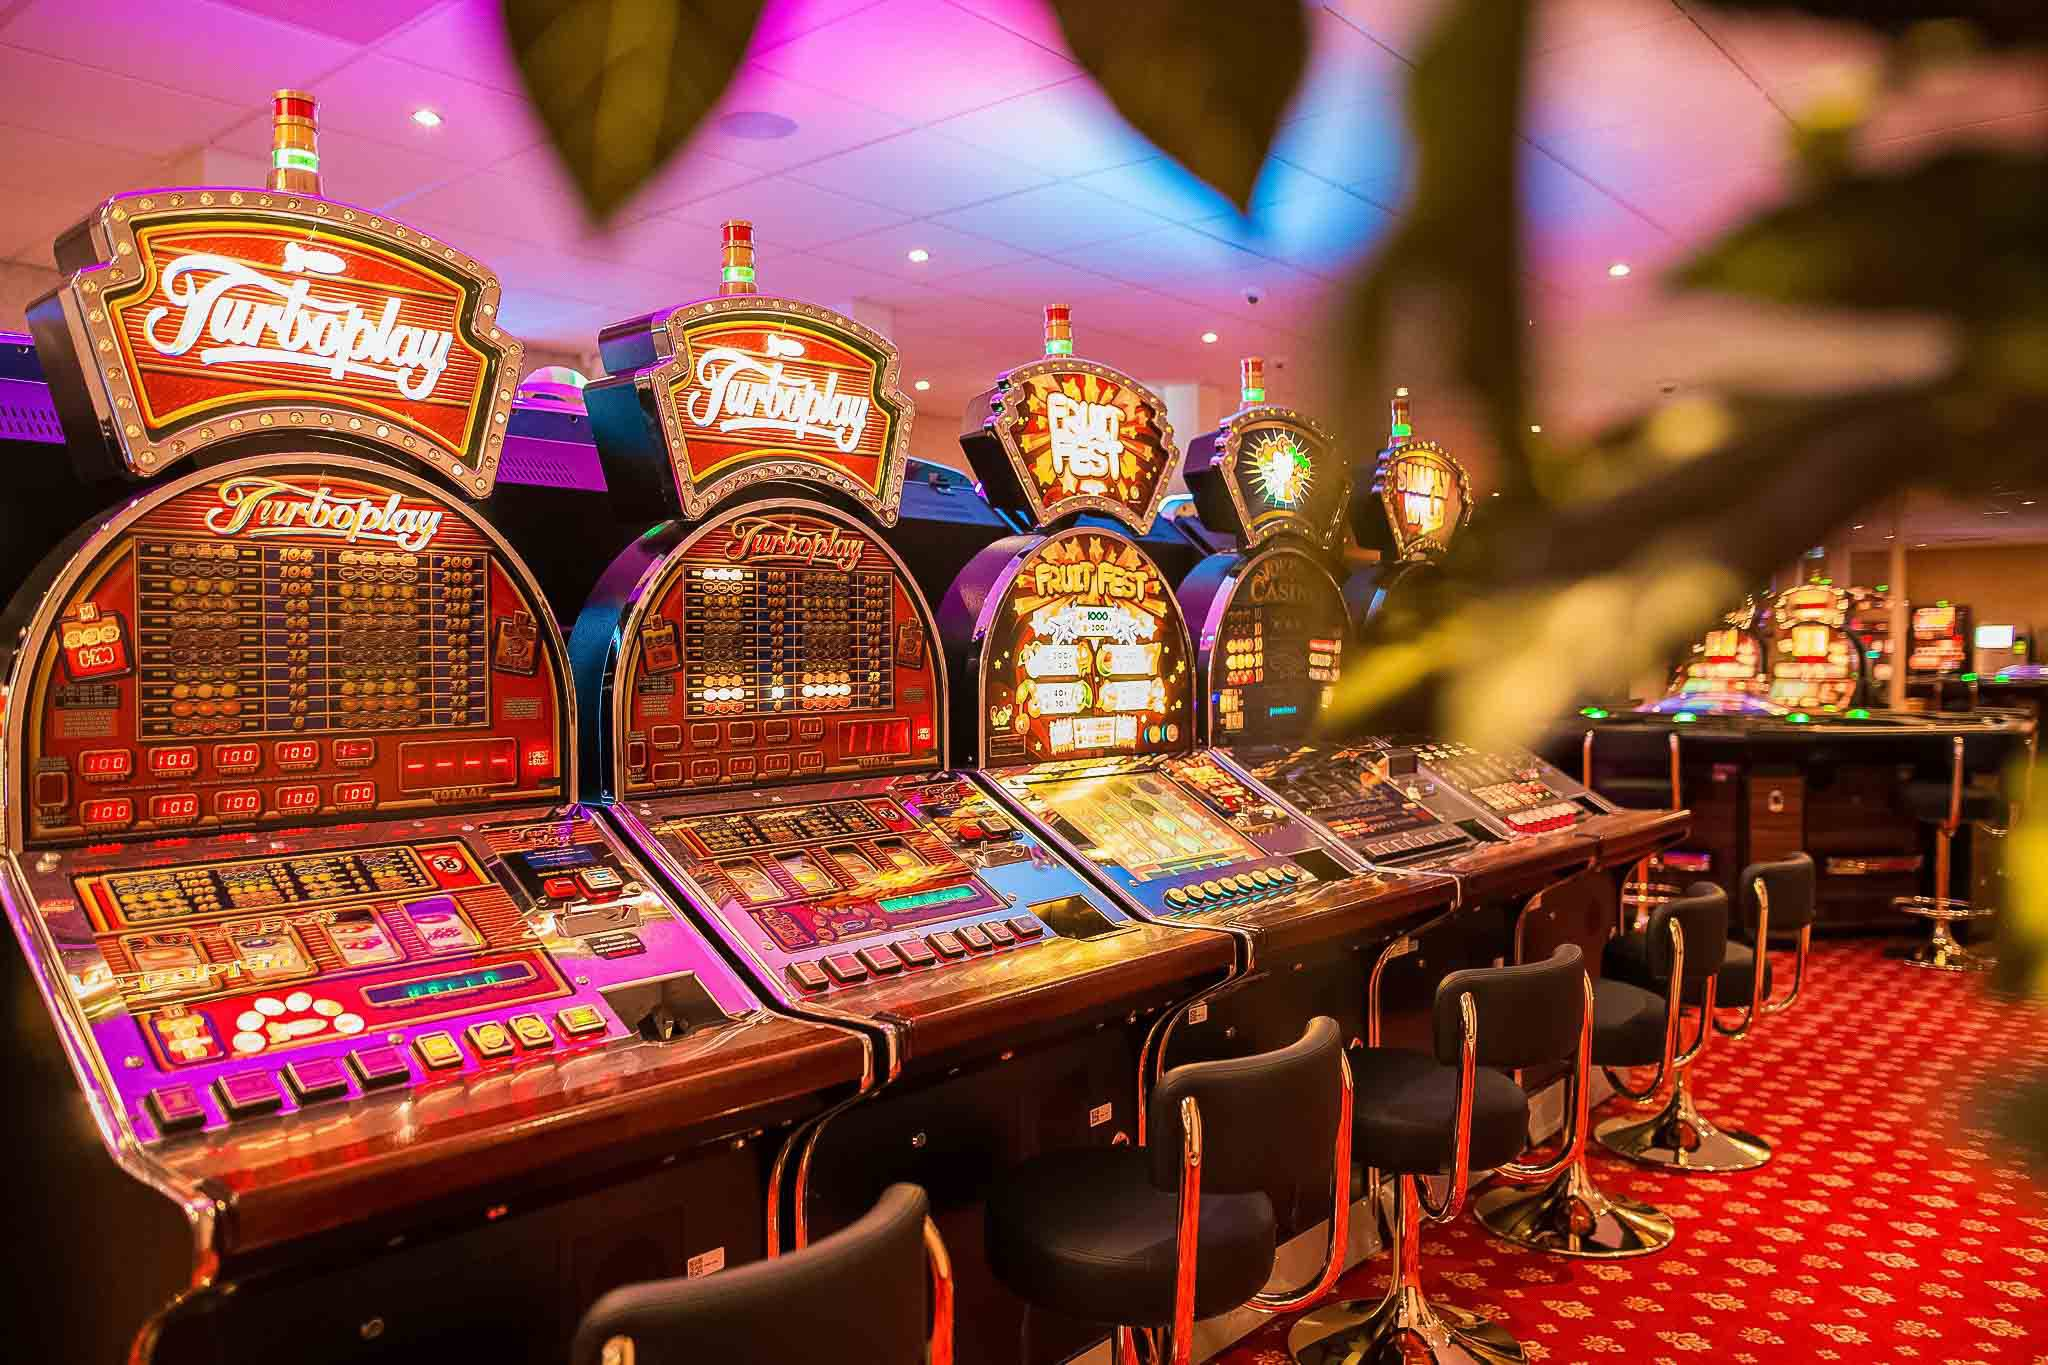 Какие слоты онлайн можно найти в казино Голд?